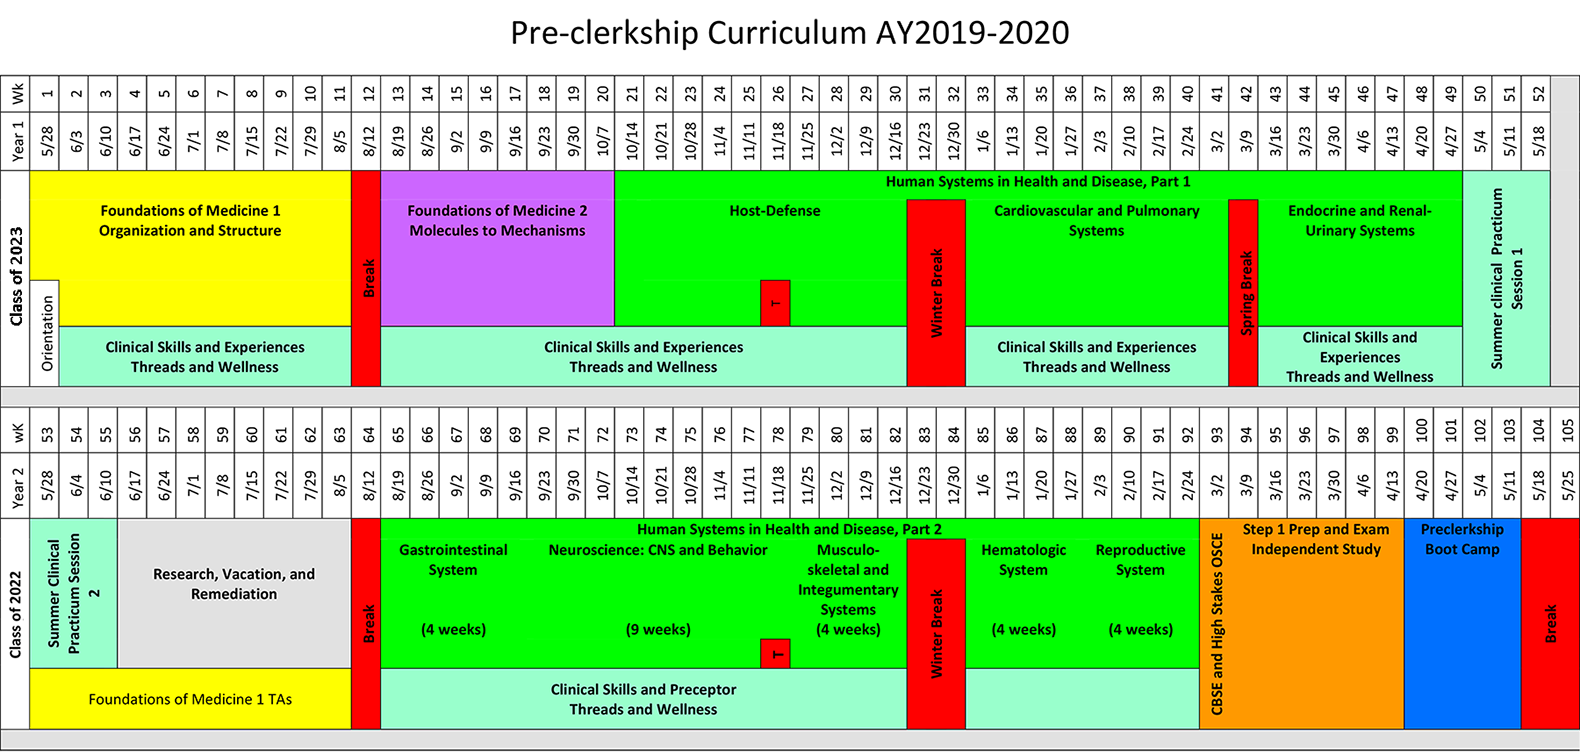 Fsu Calendar Fall 2020 academic calendar next AY | College of Medicine